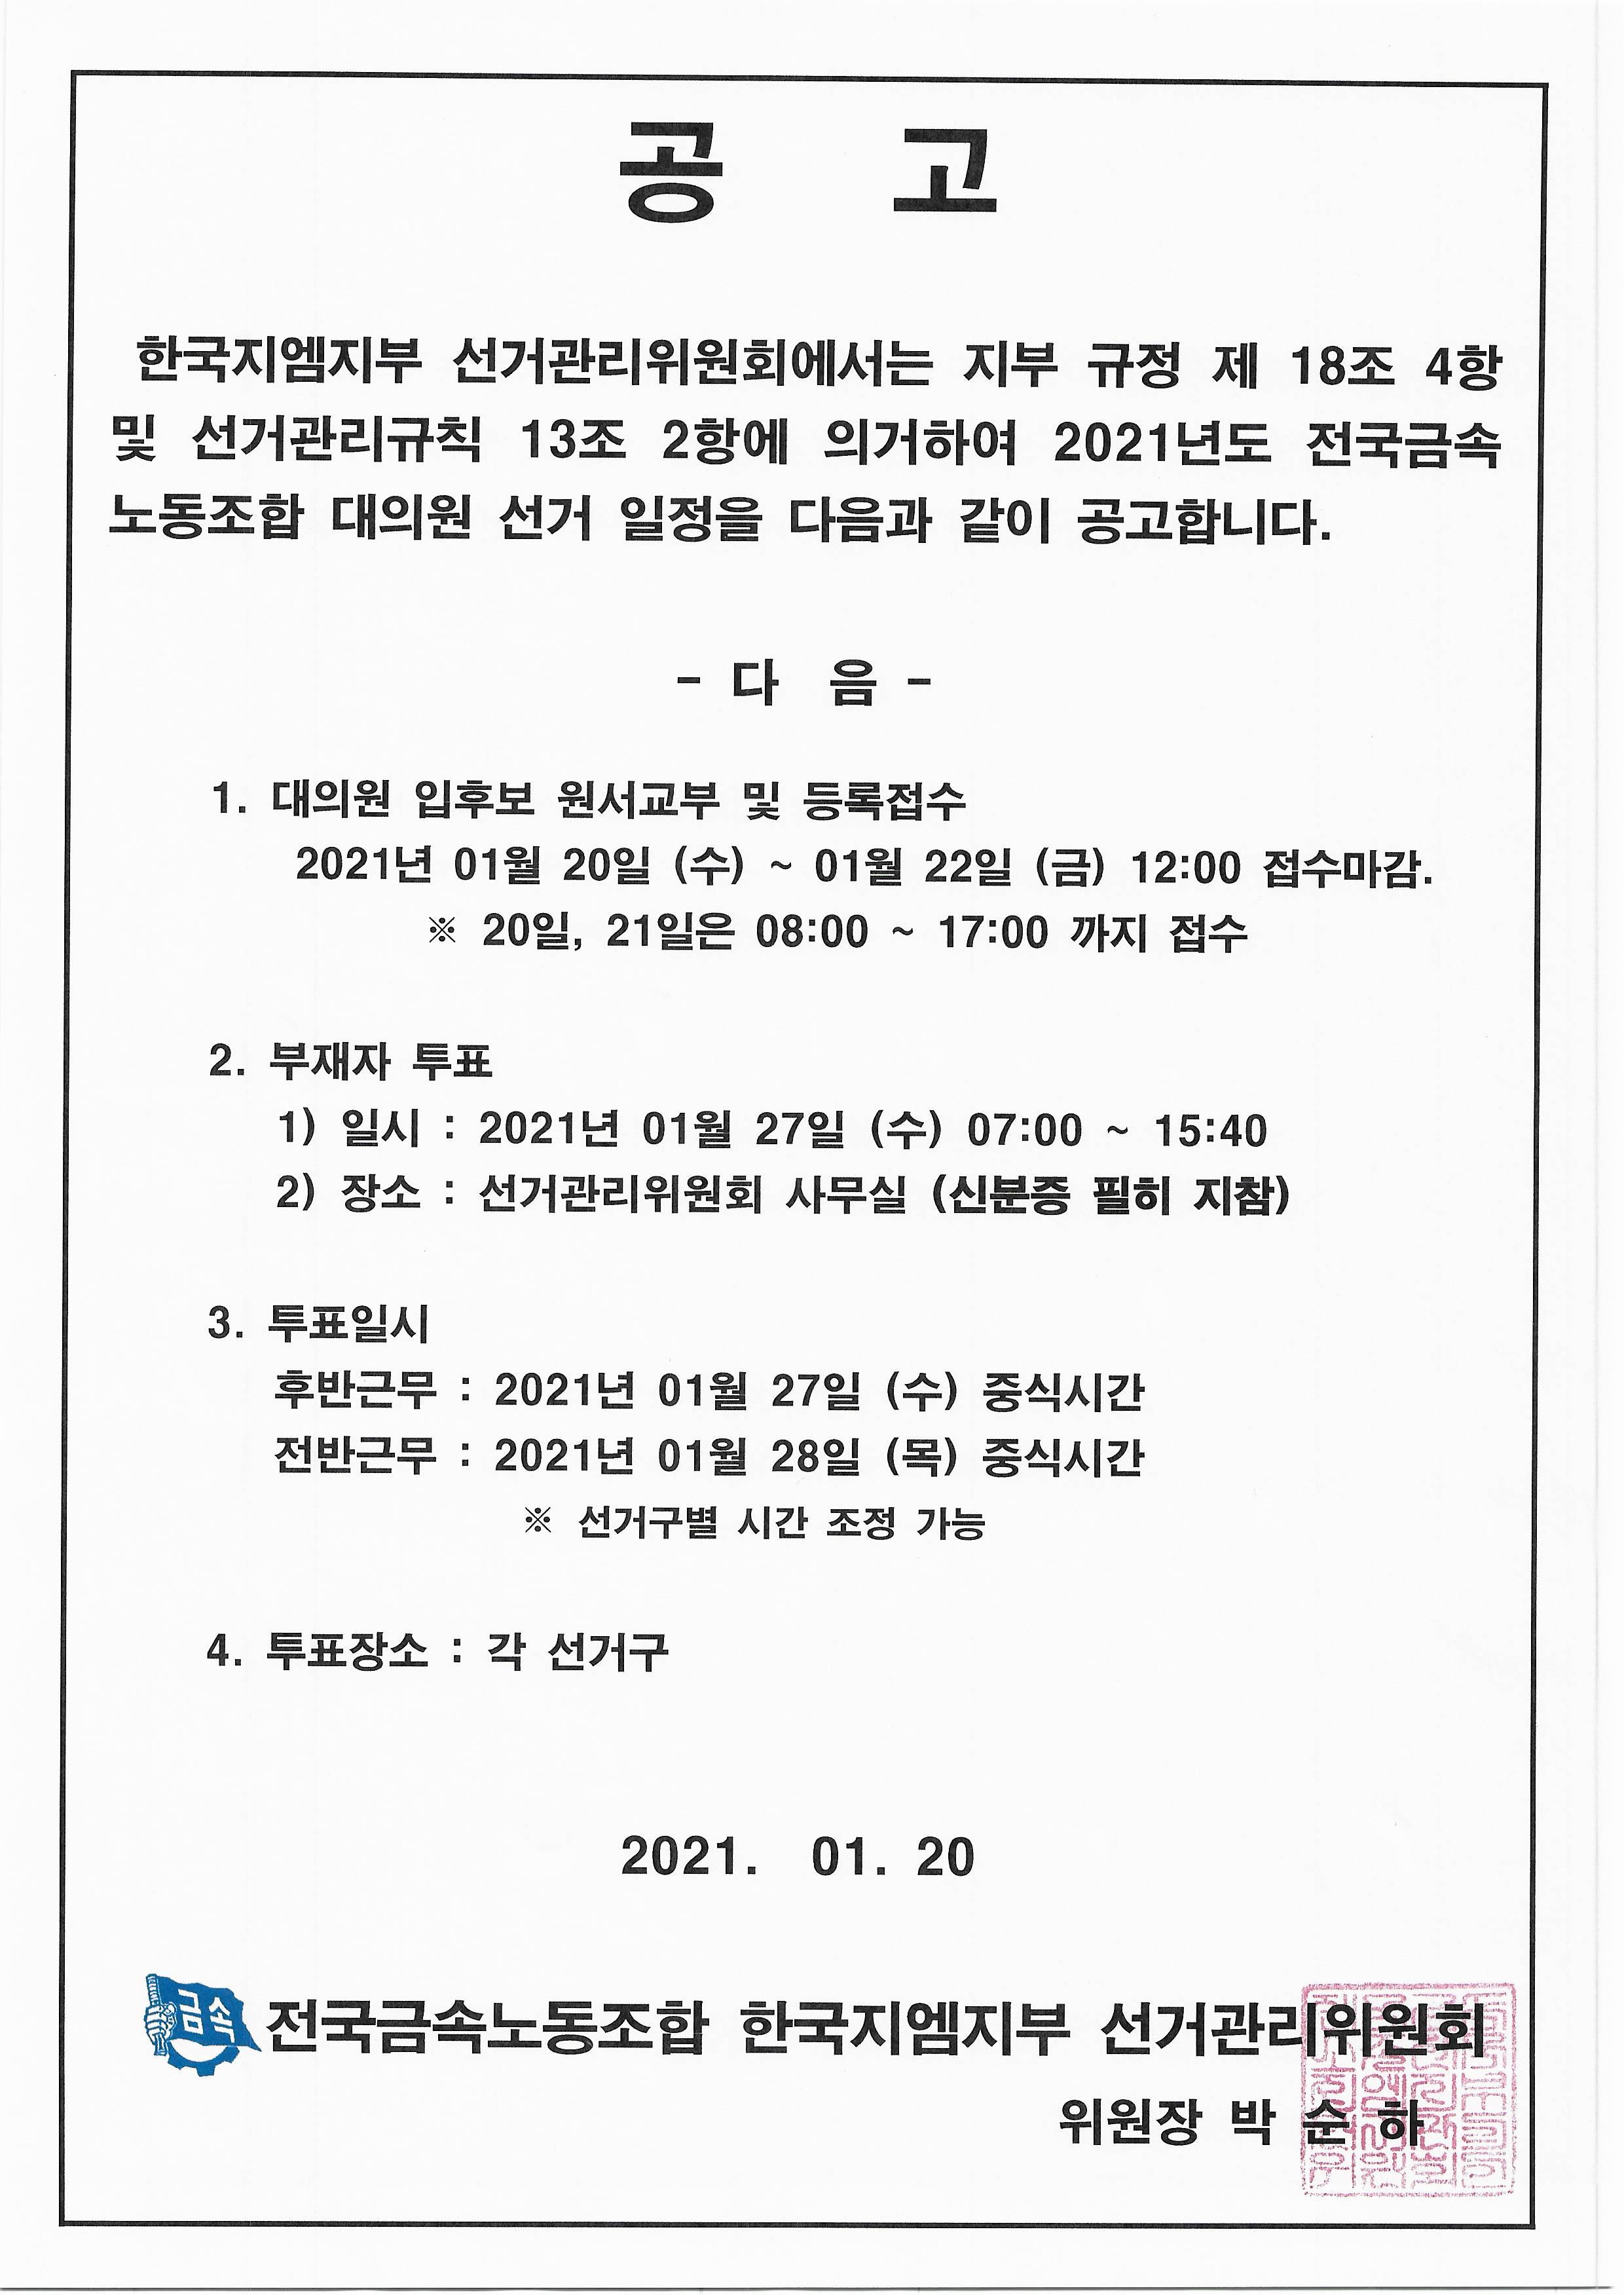 KakaoTalk_20210120_080127060.png